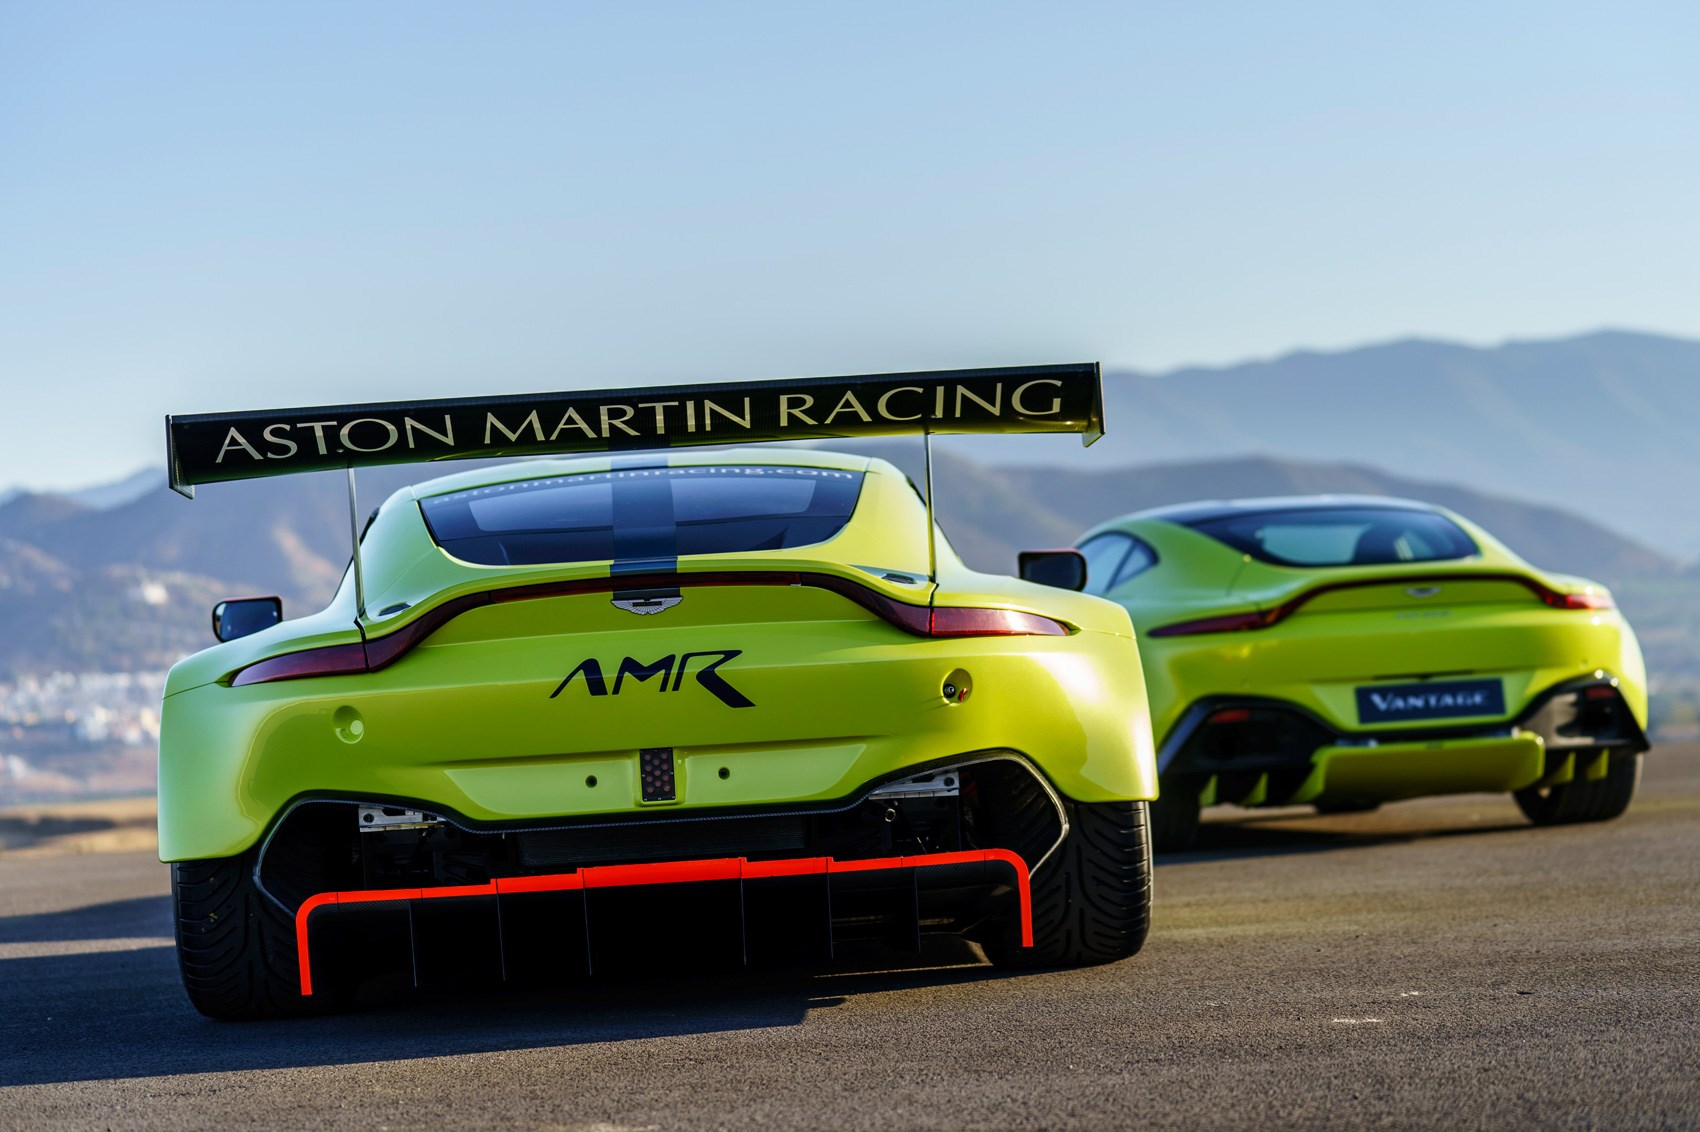 Meet The World Eater New Aston Martin Racing Vantage Gte Revealed